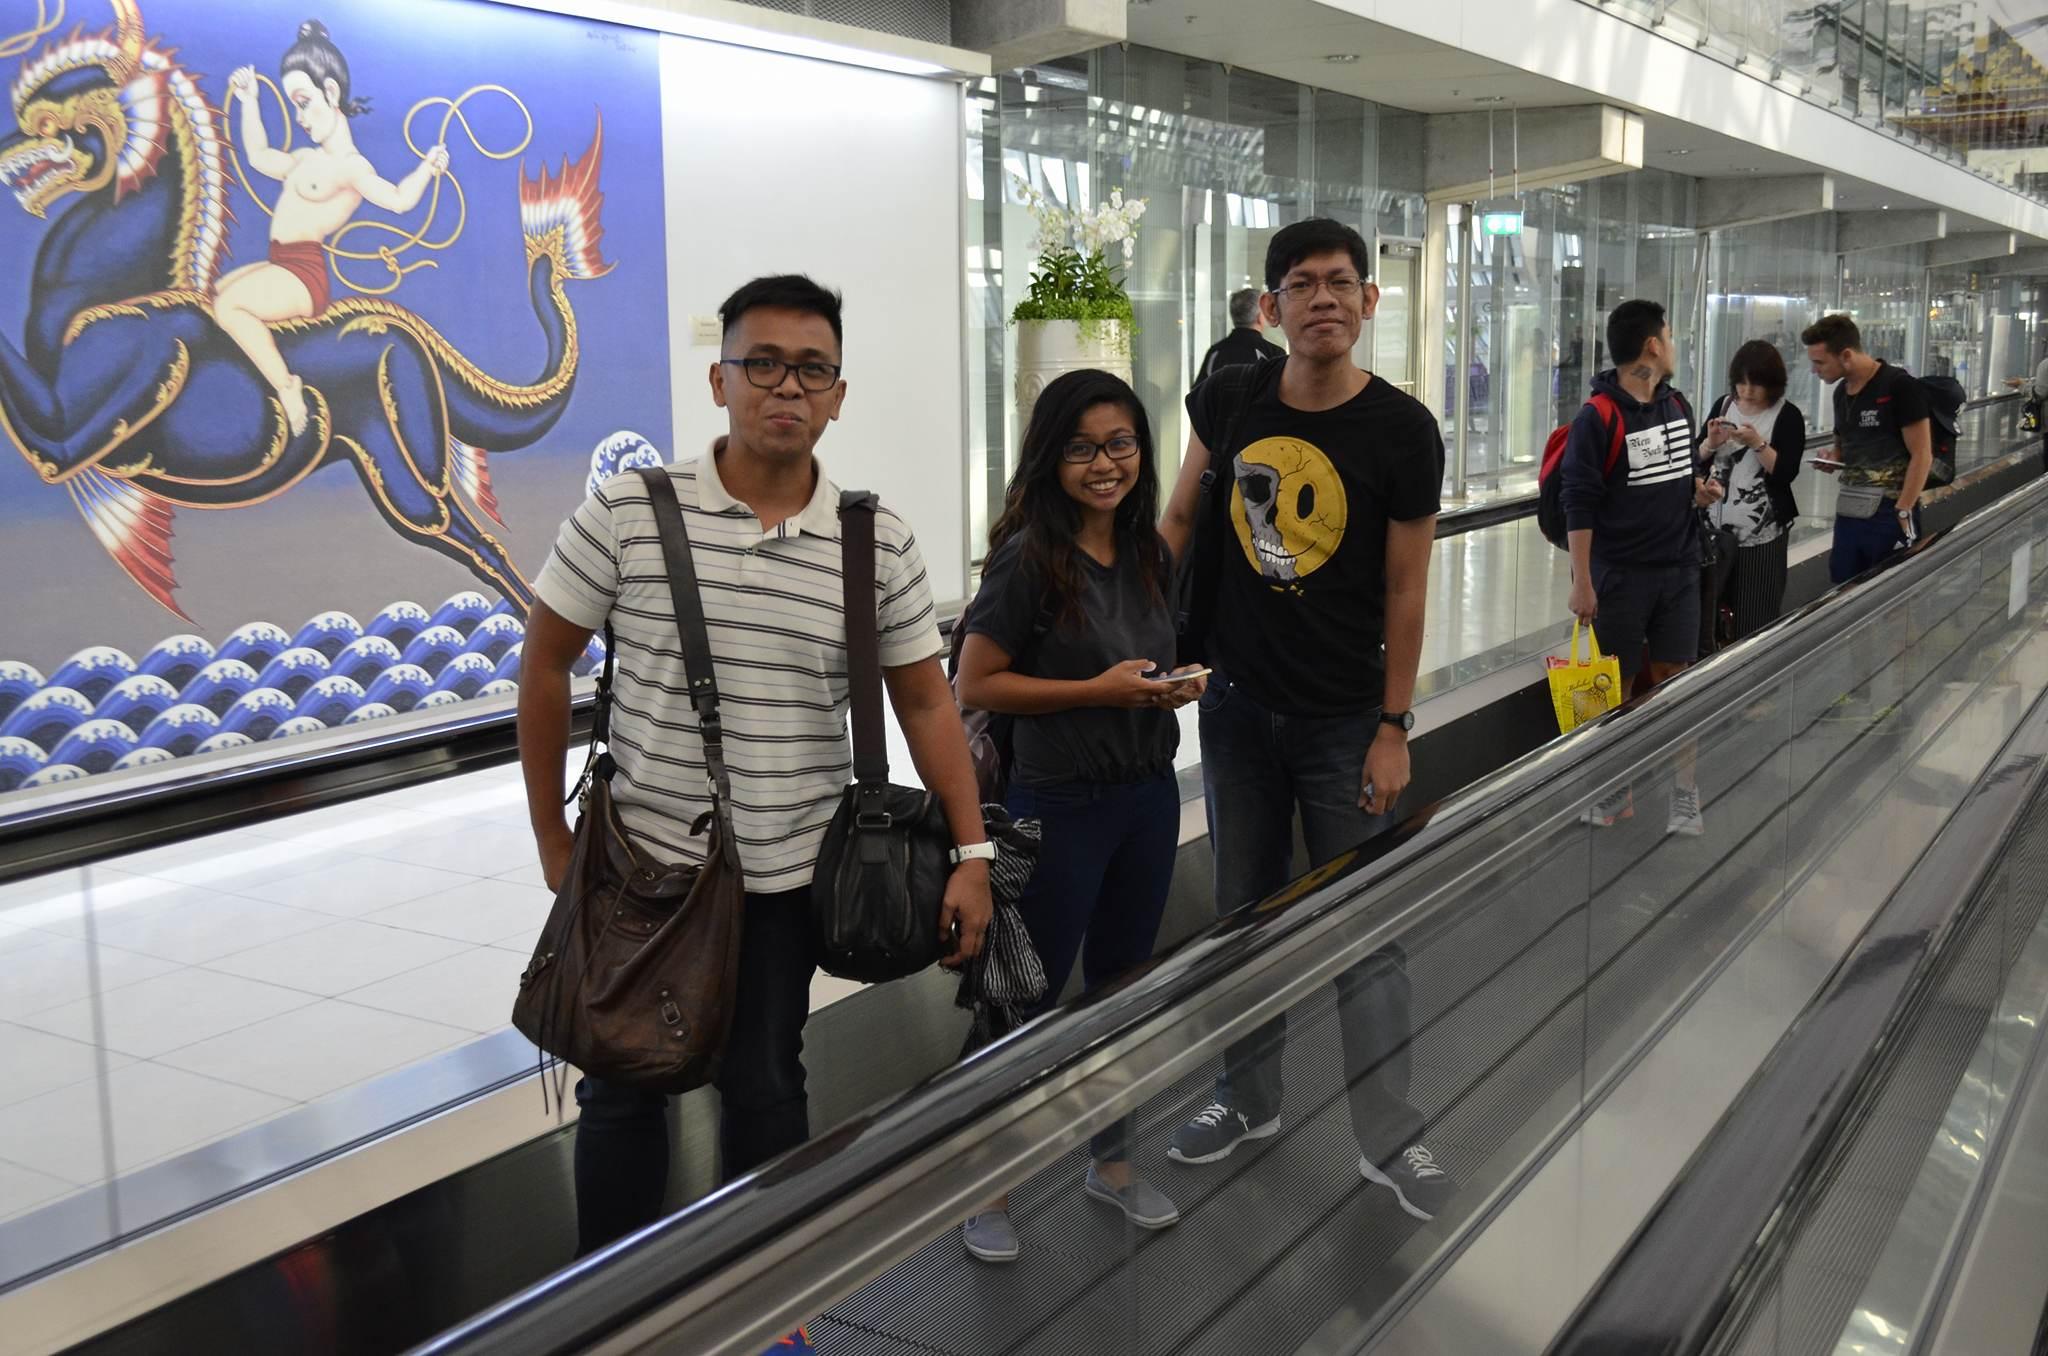 At Suvarnabhumi International Airport